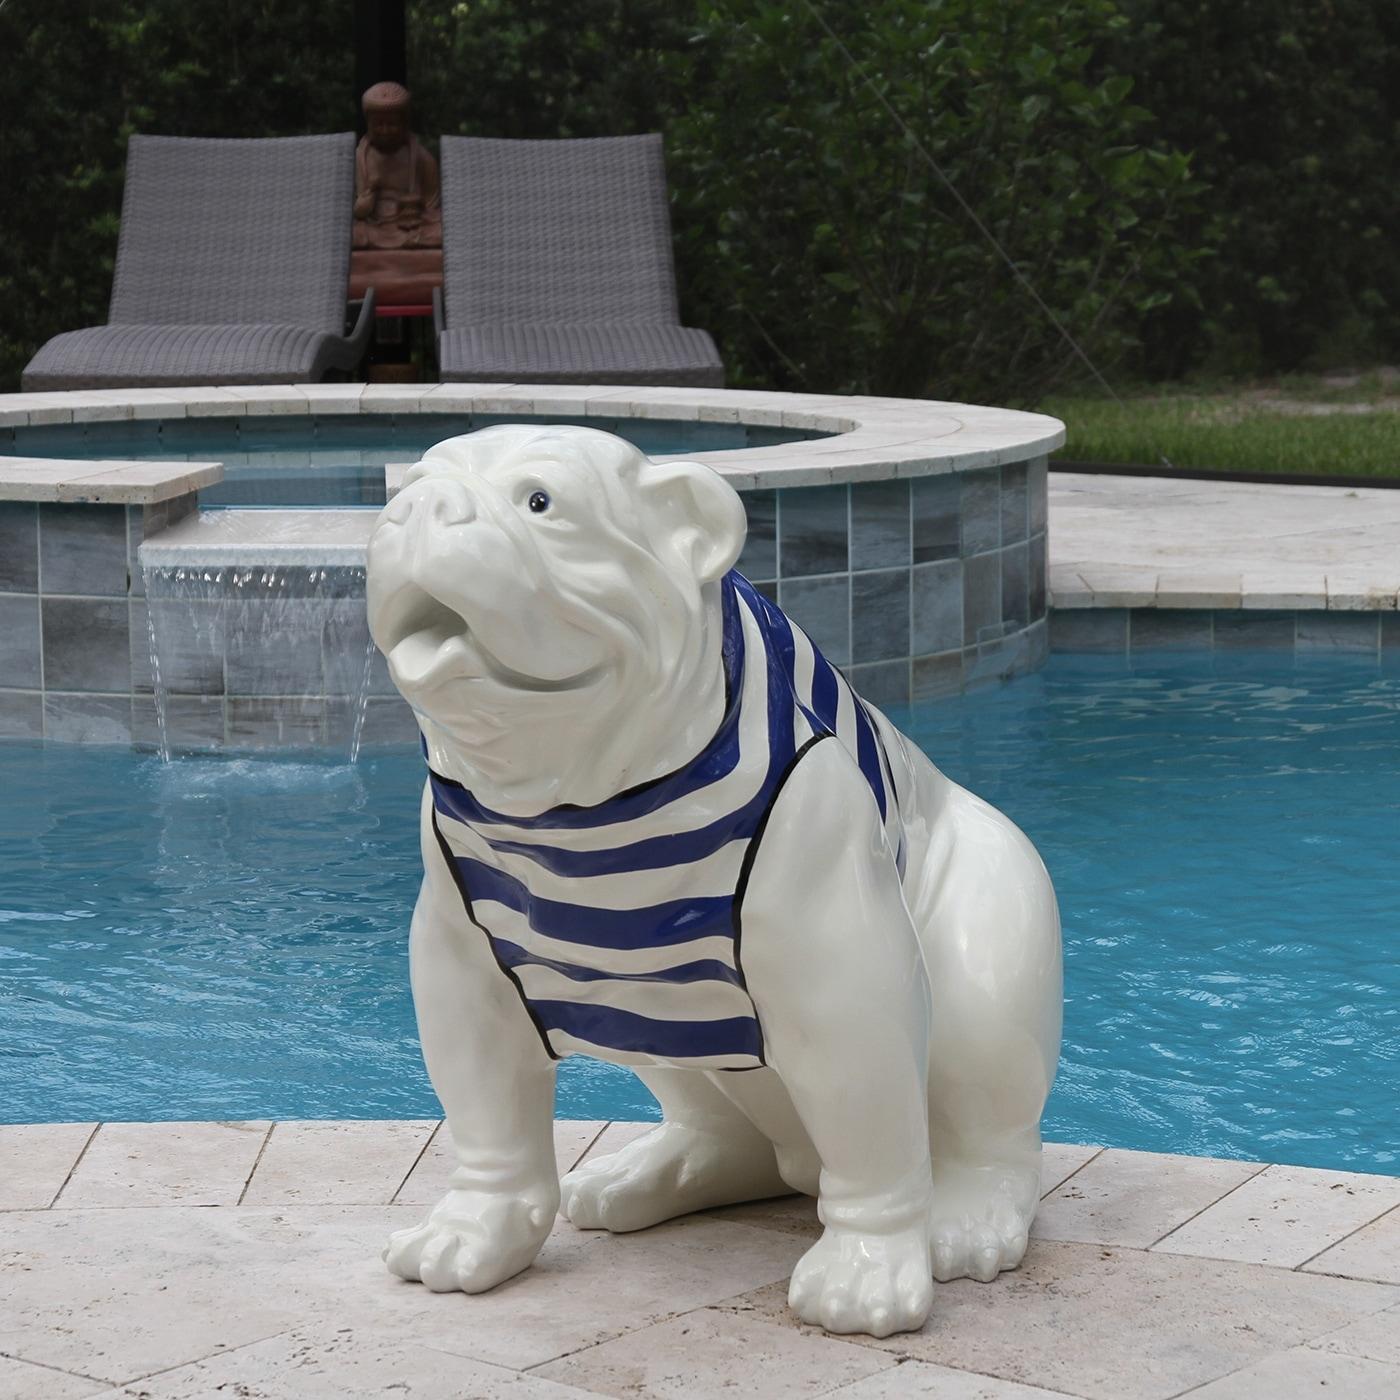 Seated English Bulldog Resin Statue White Blue Stripes 33 L X 17 W X 28 H Overstock 31567810